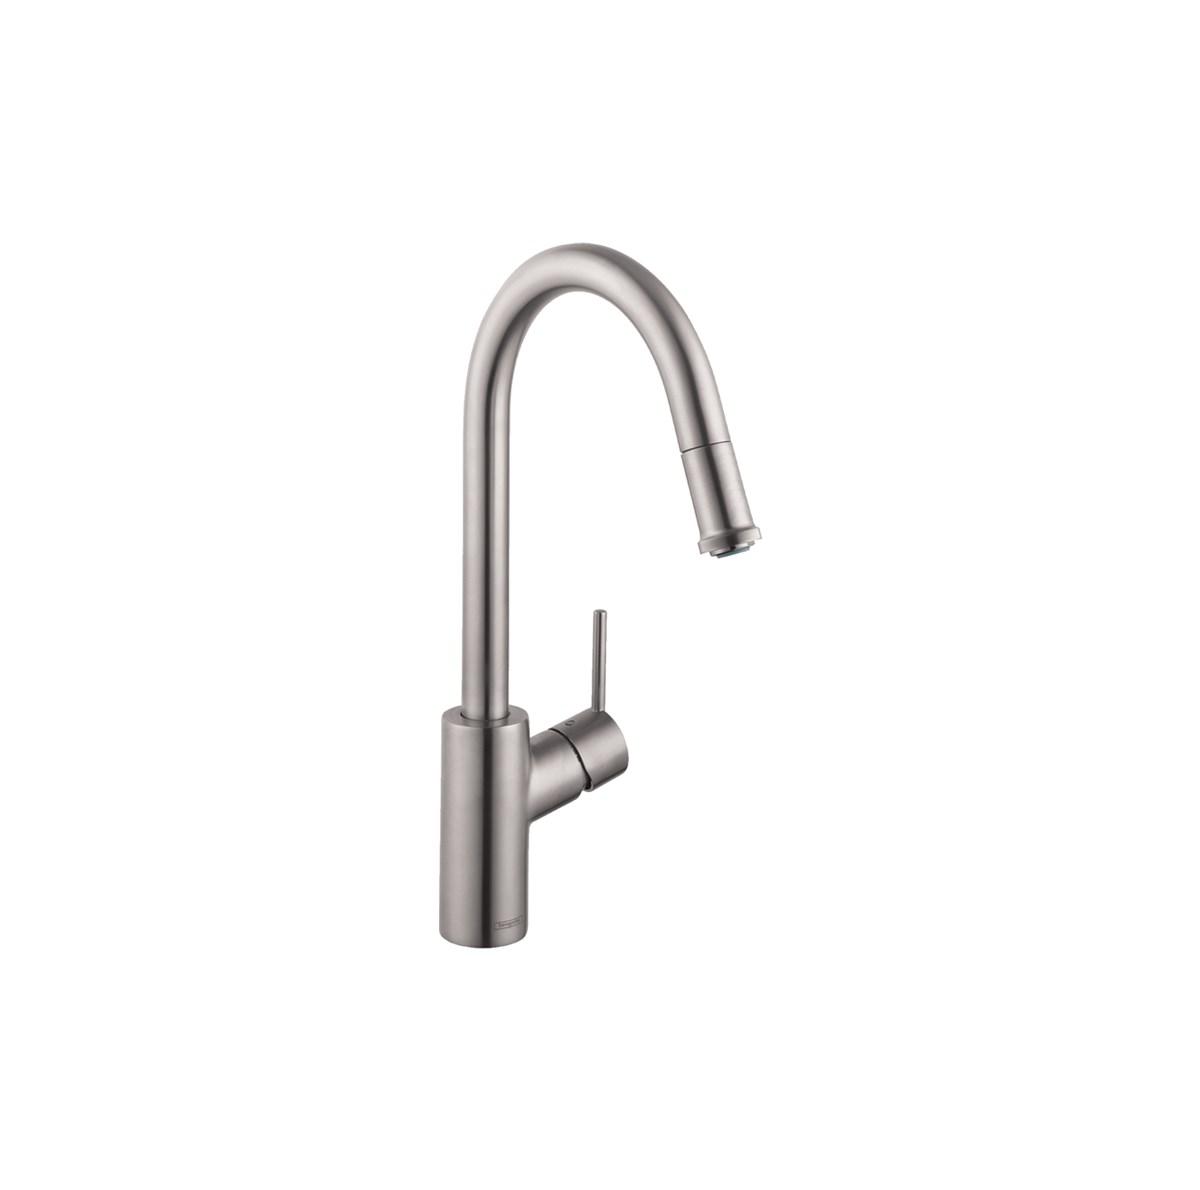 Hansgrohe-Talis-M52-Kitchen-Mixer-260-73864000-Matisse-1